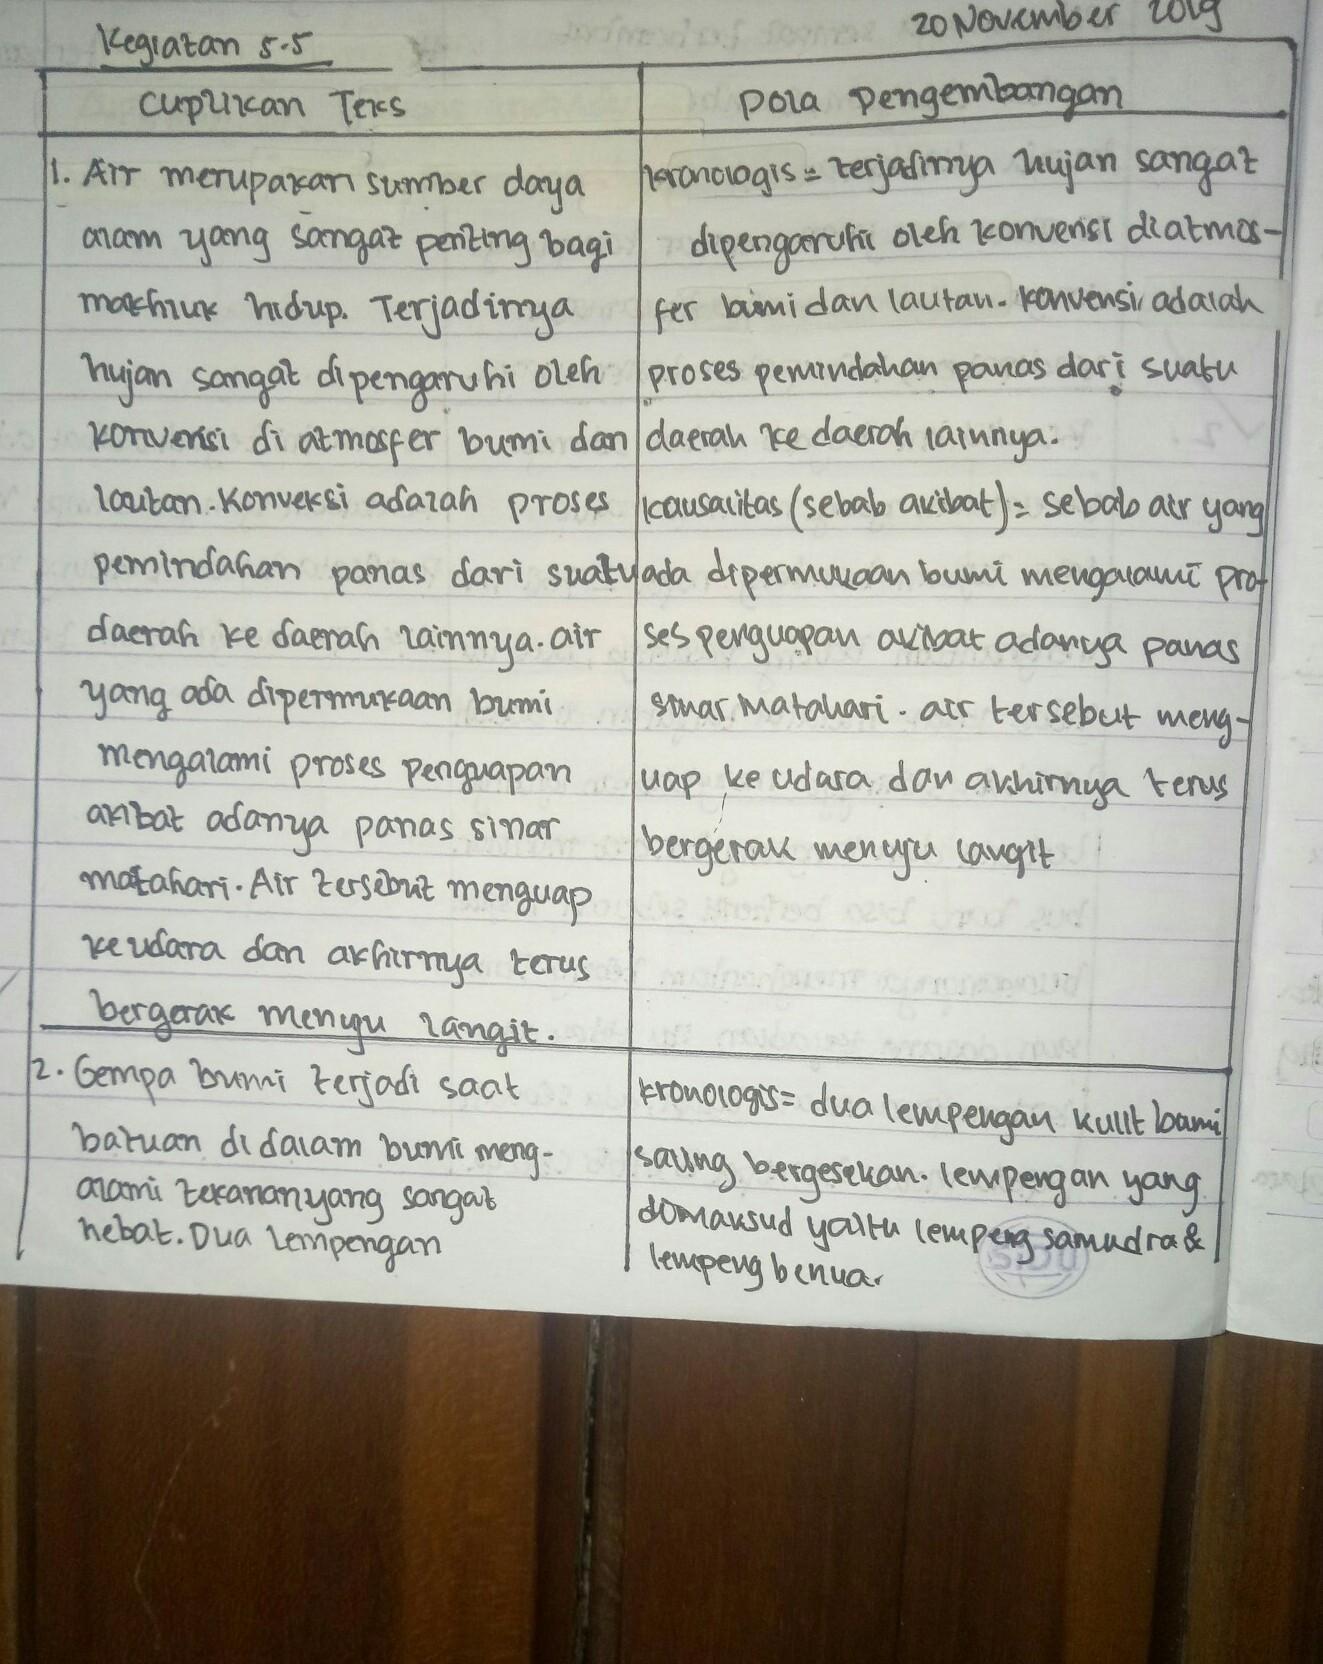 Kegiatan 5.5 Bahasa Indonesia Kelas 8 : kegiatan, bahasa, indonesia, kelas, Jawaban, Bahasa, Indonesia, Kelas, Brainly.co.id